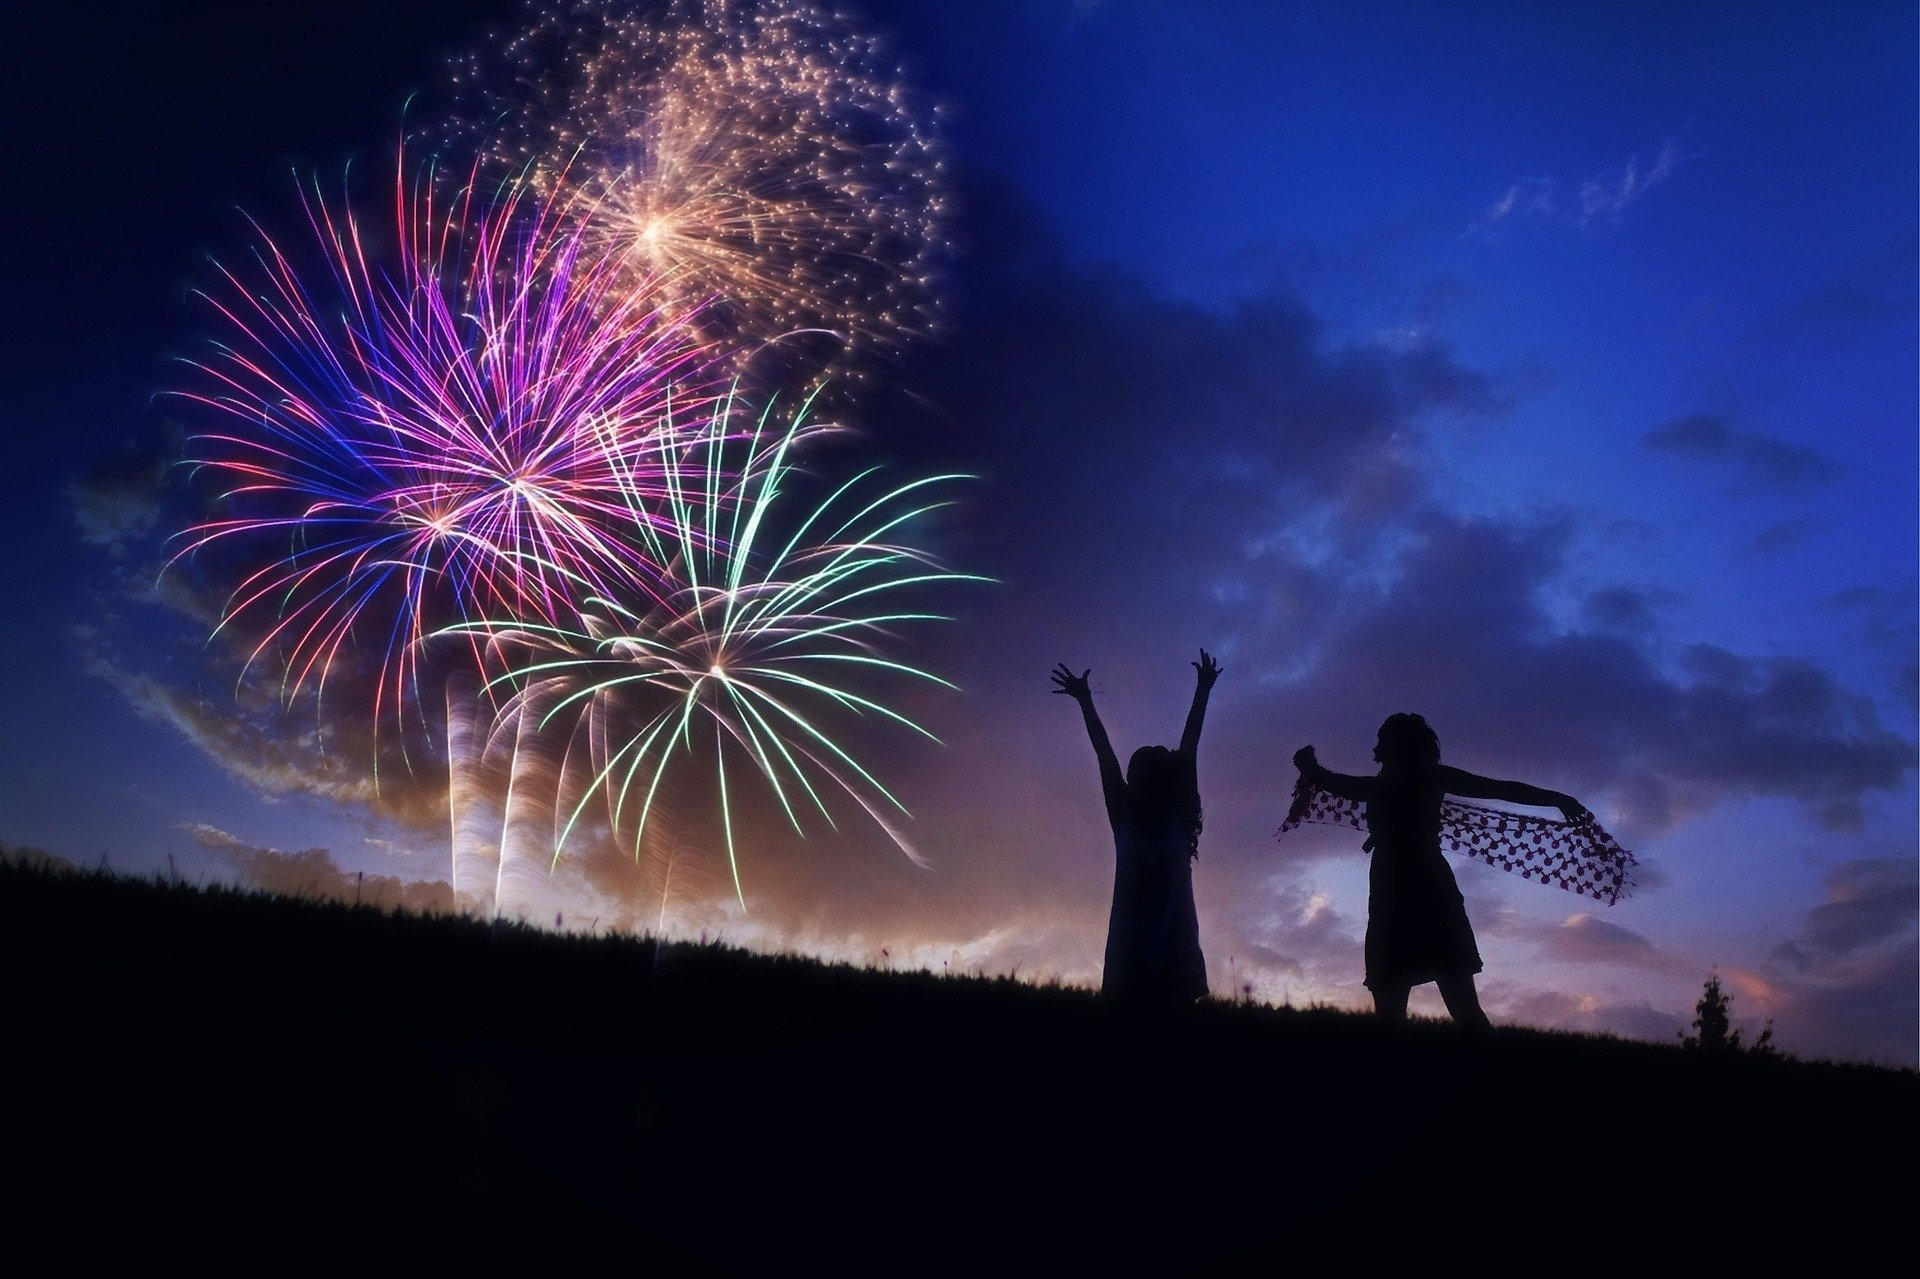 fireworks-804838_1920 2